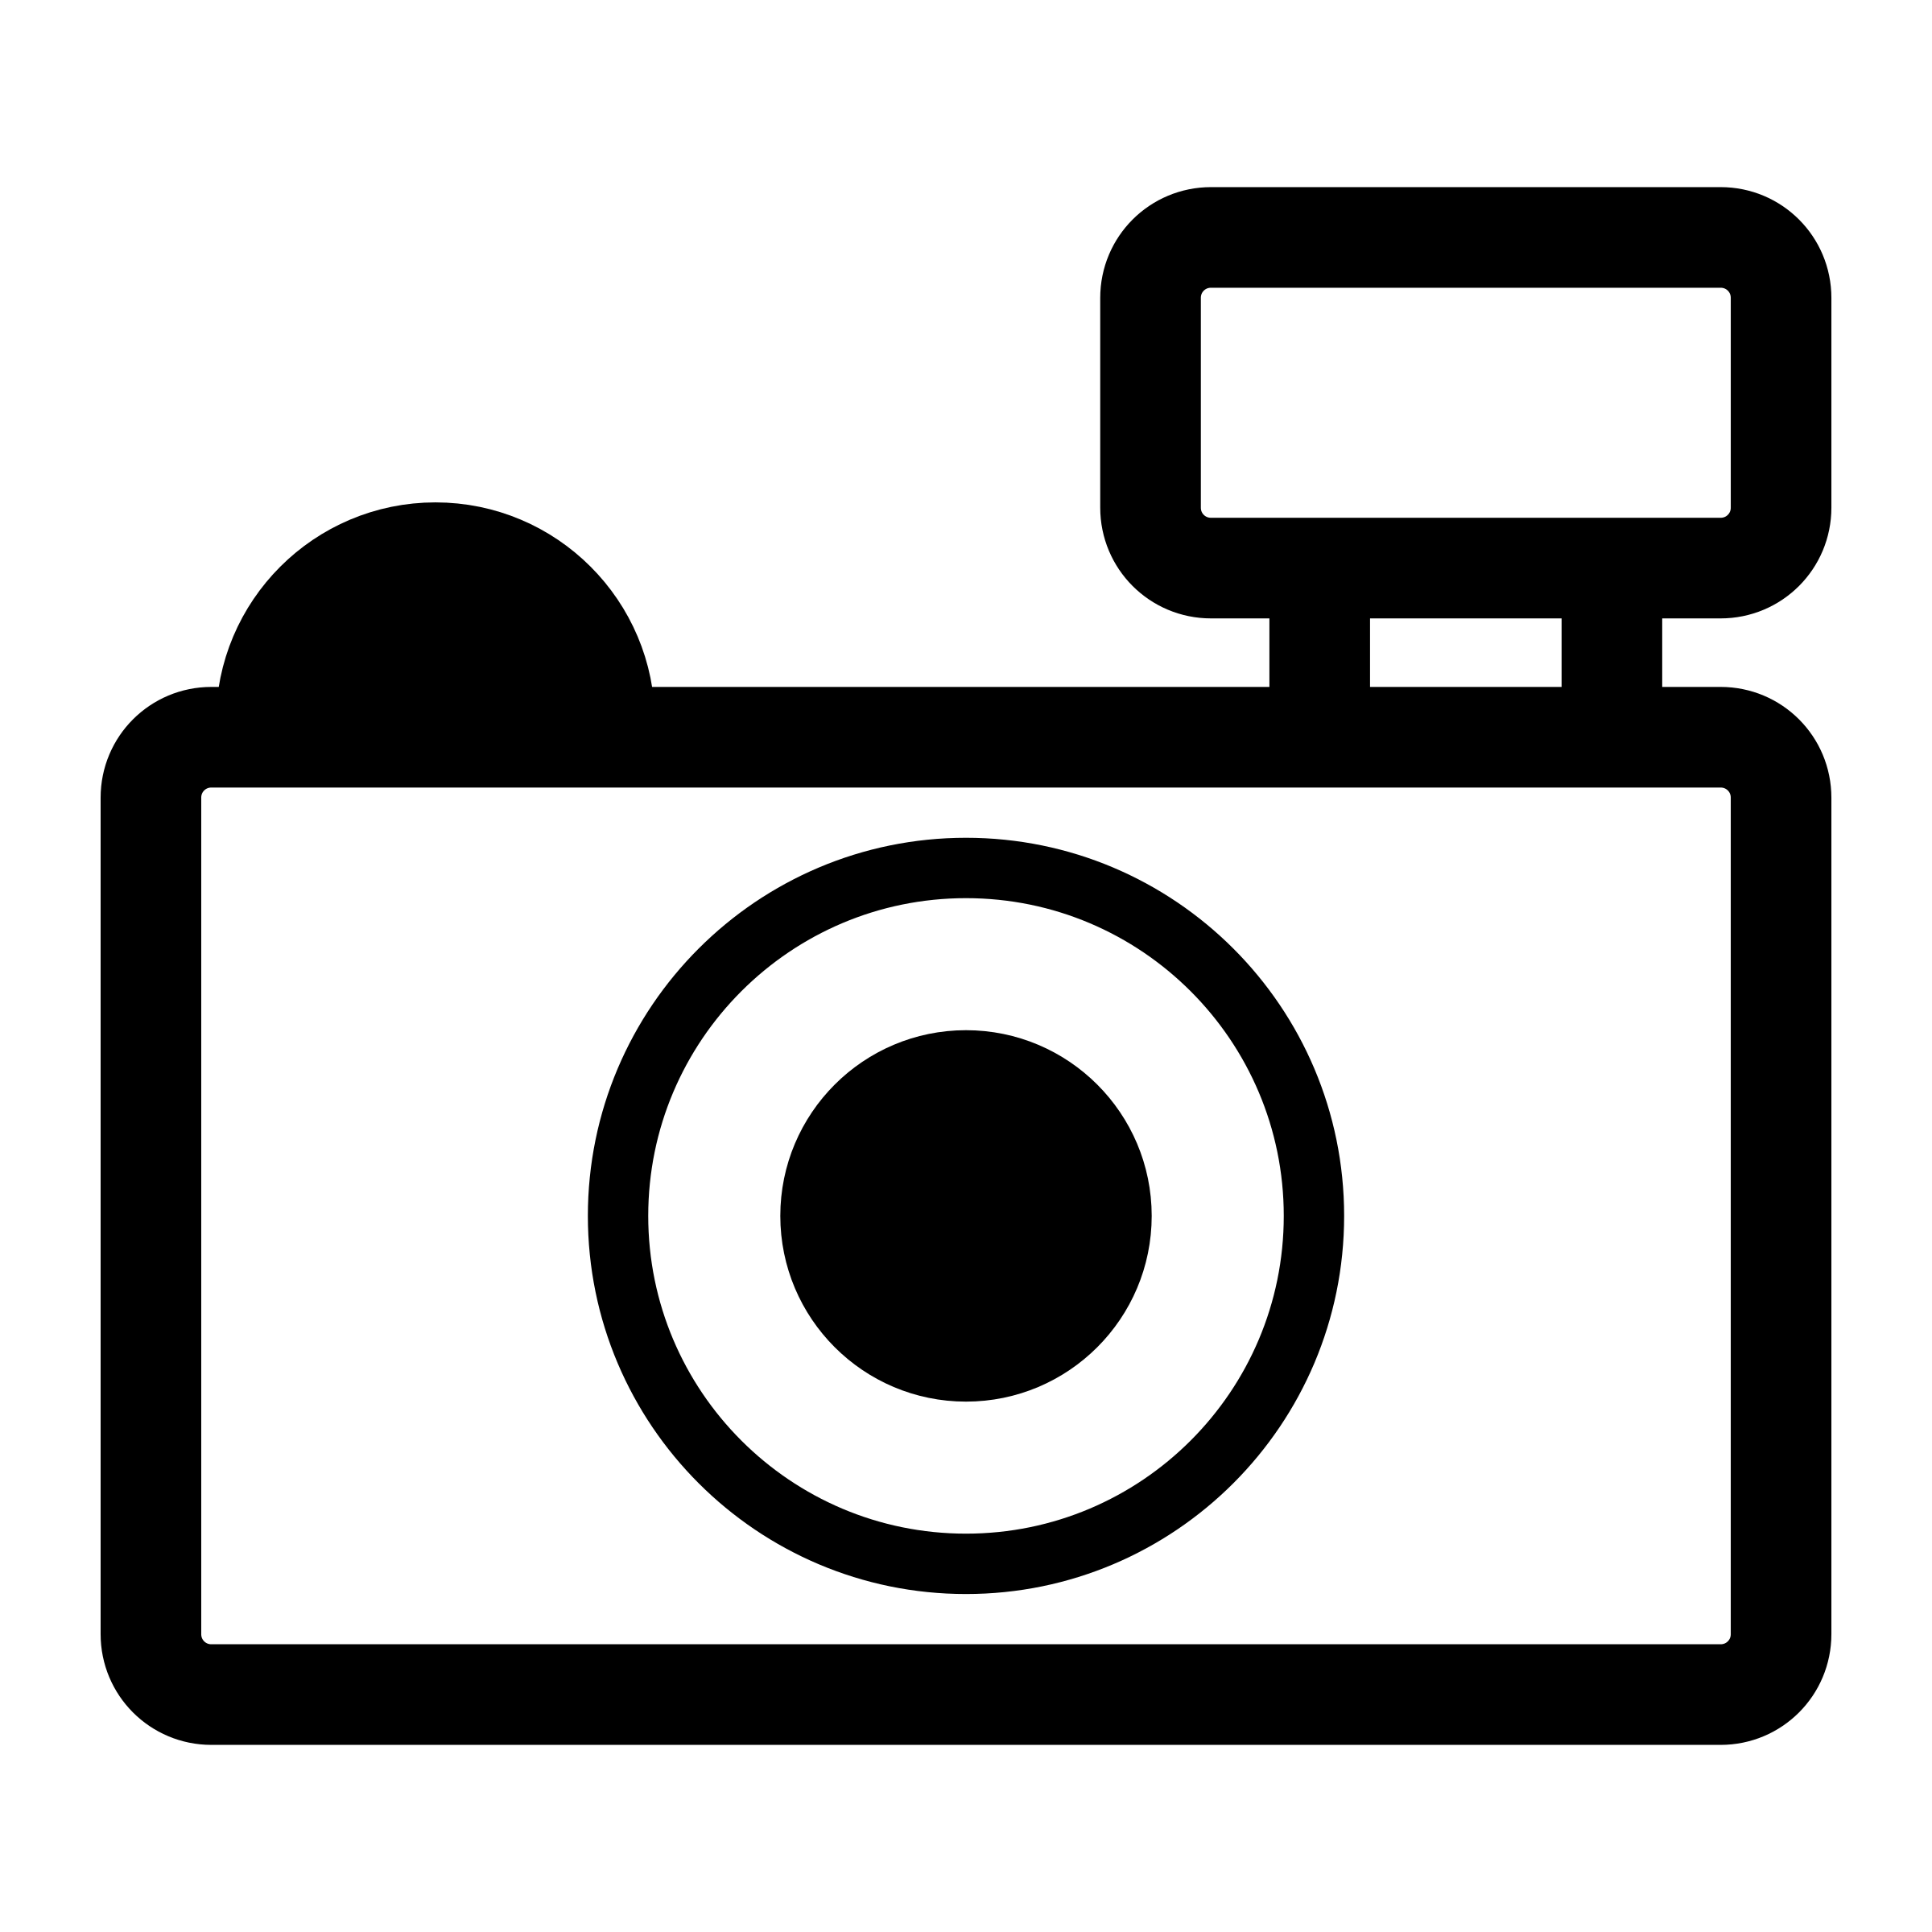 Camera Clipart-camera clipart-3